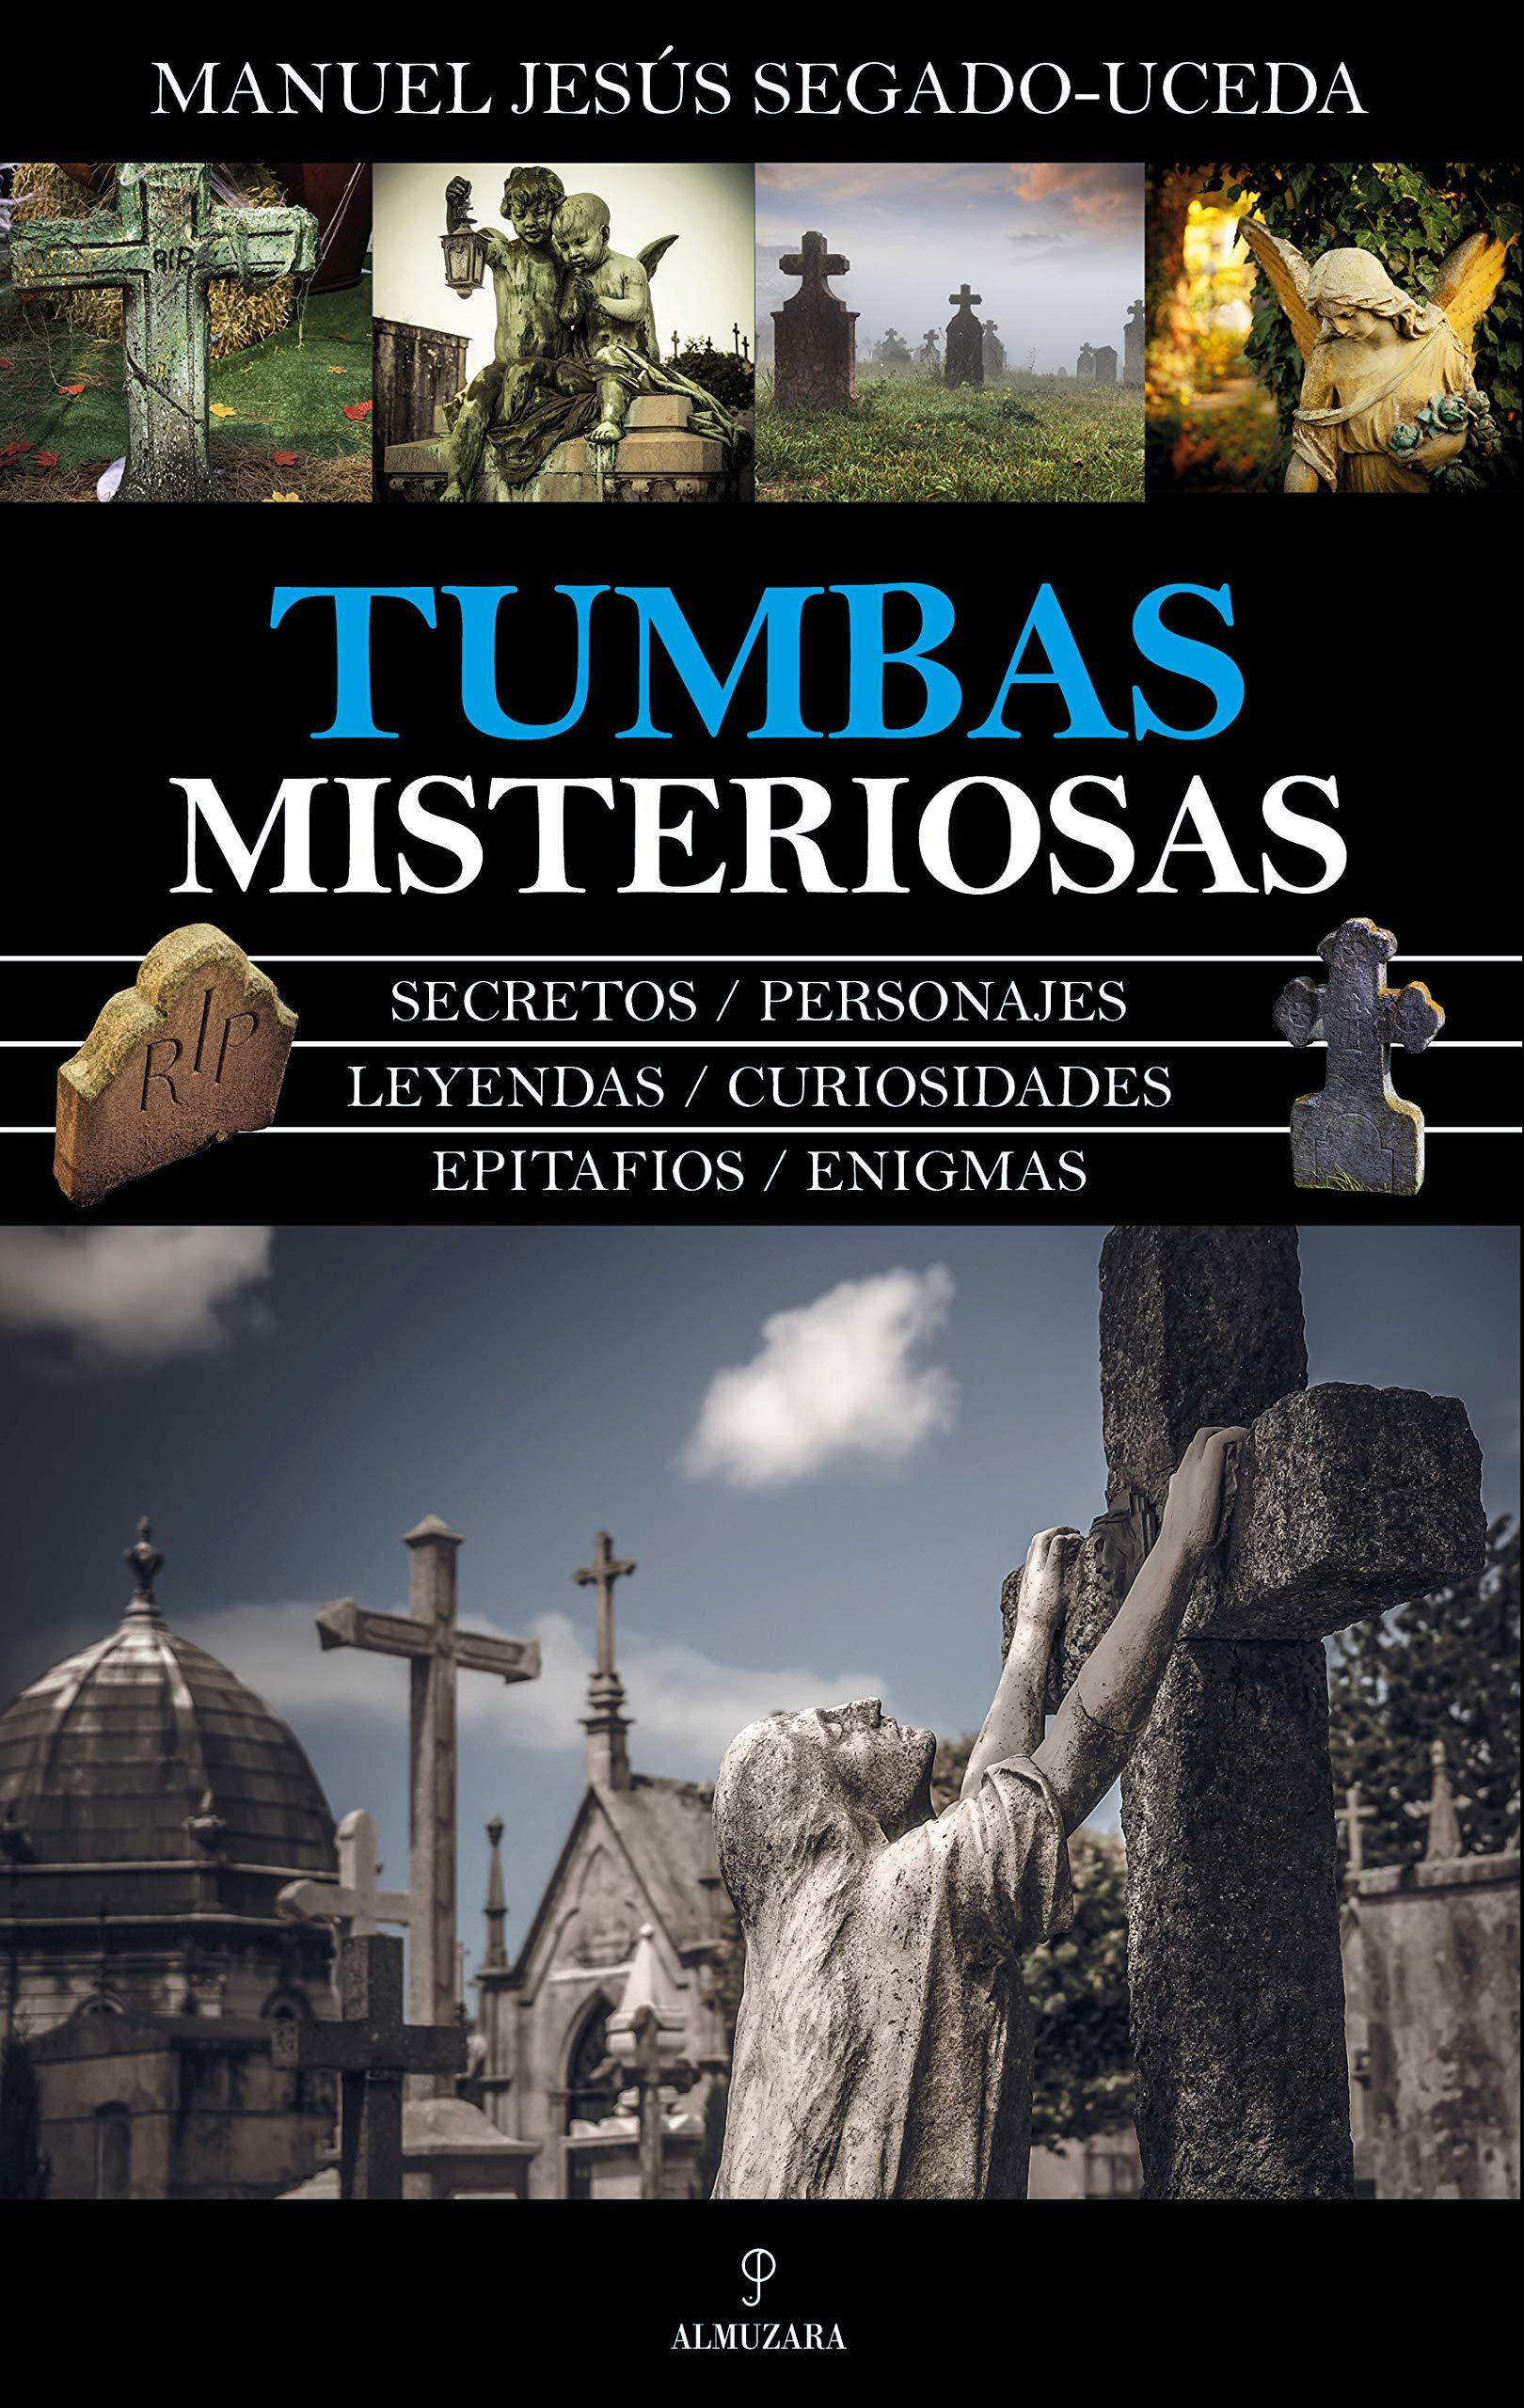 Tumbas misteriosas (Enigma): Amazon.es: Segado Uceda, Manuel Jesús ...